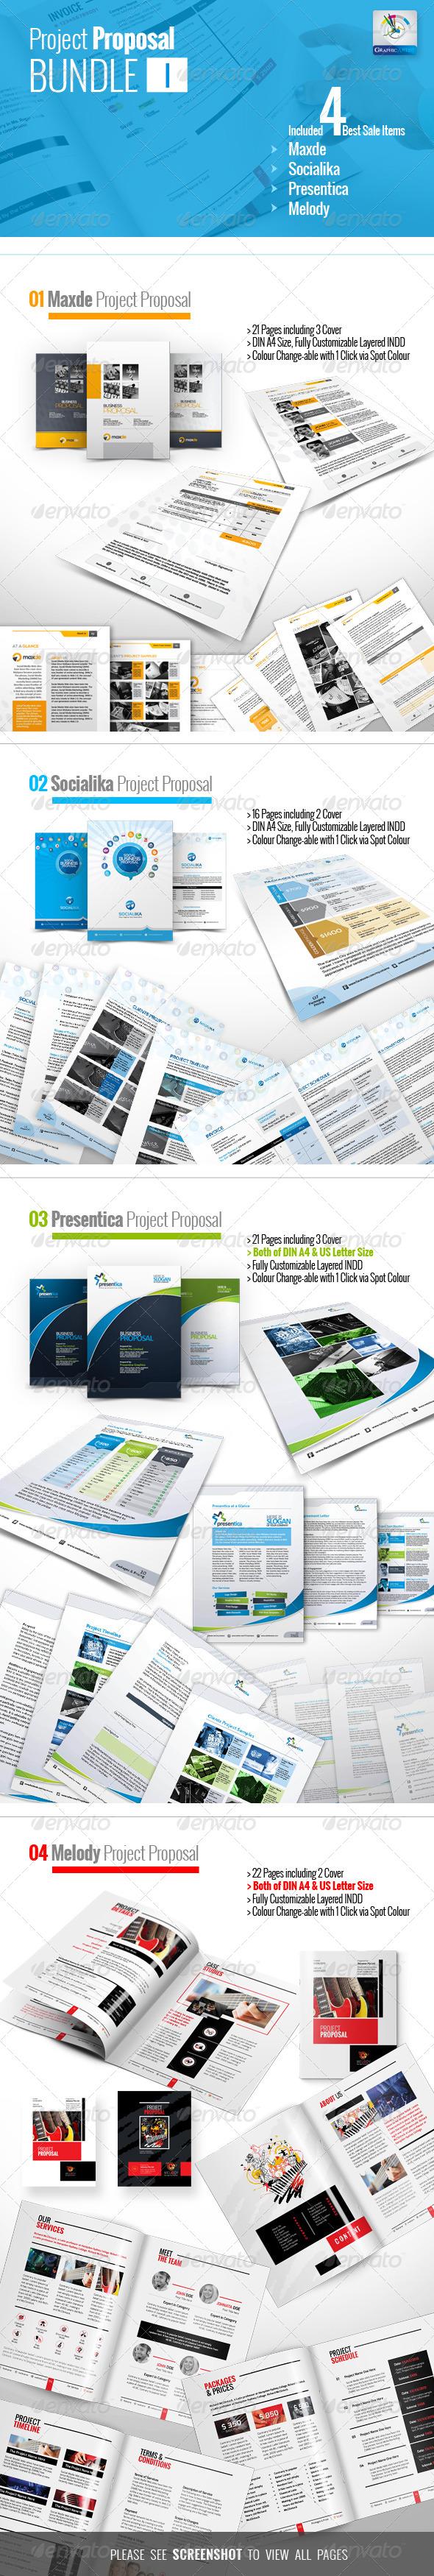 GraphicRiver Project Proposal Bundle I 5905155